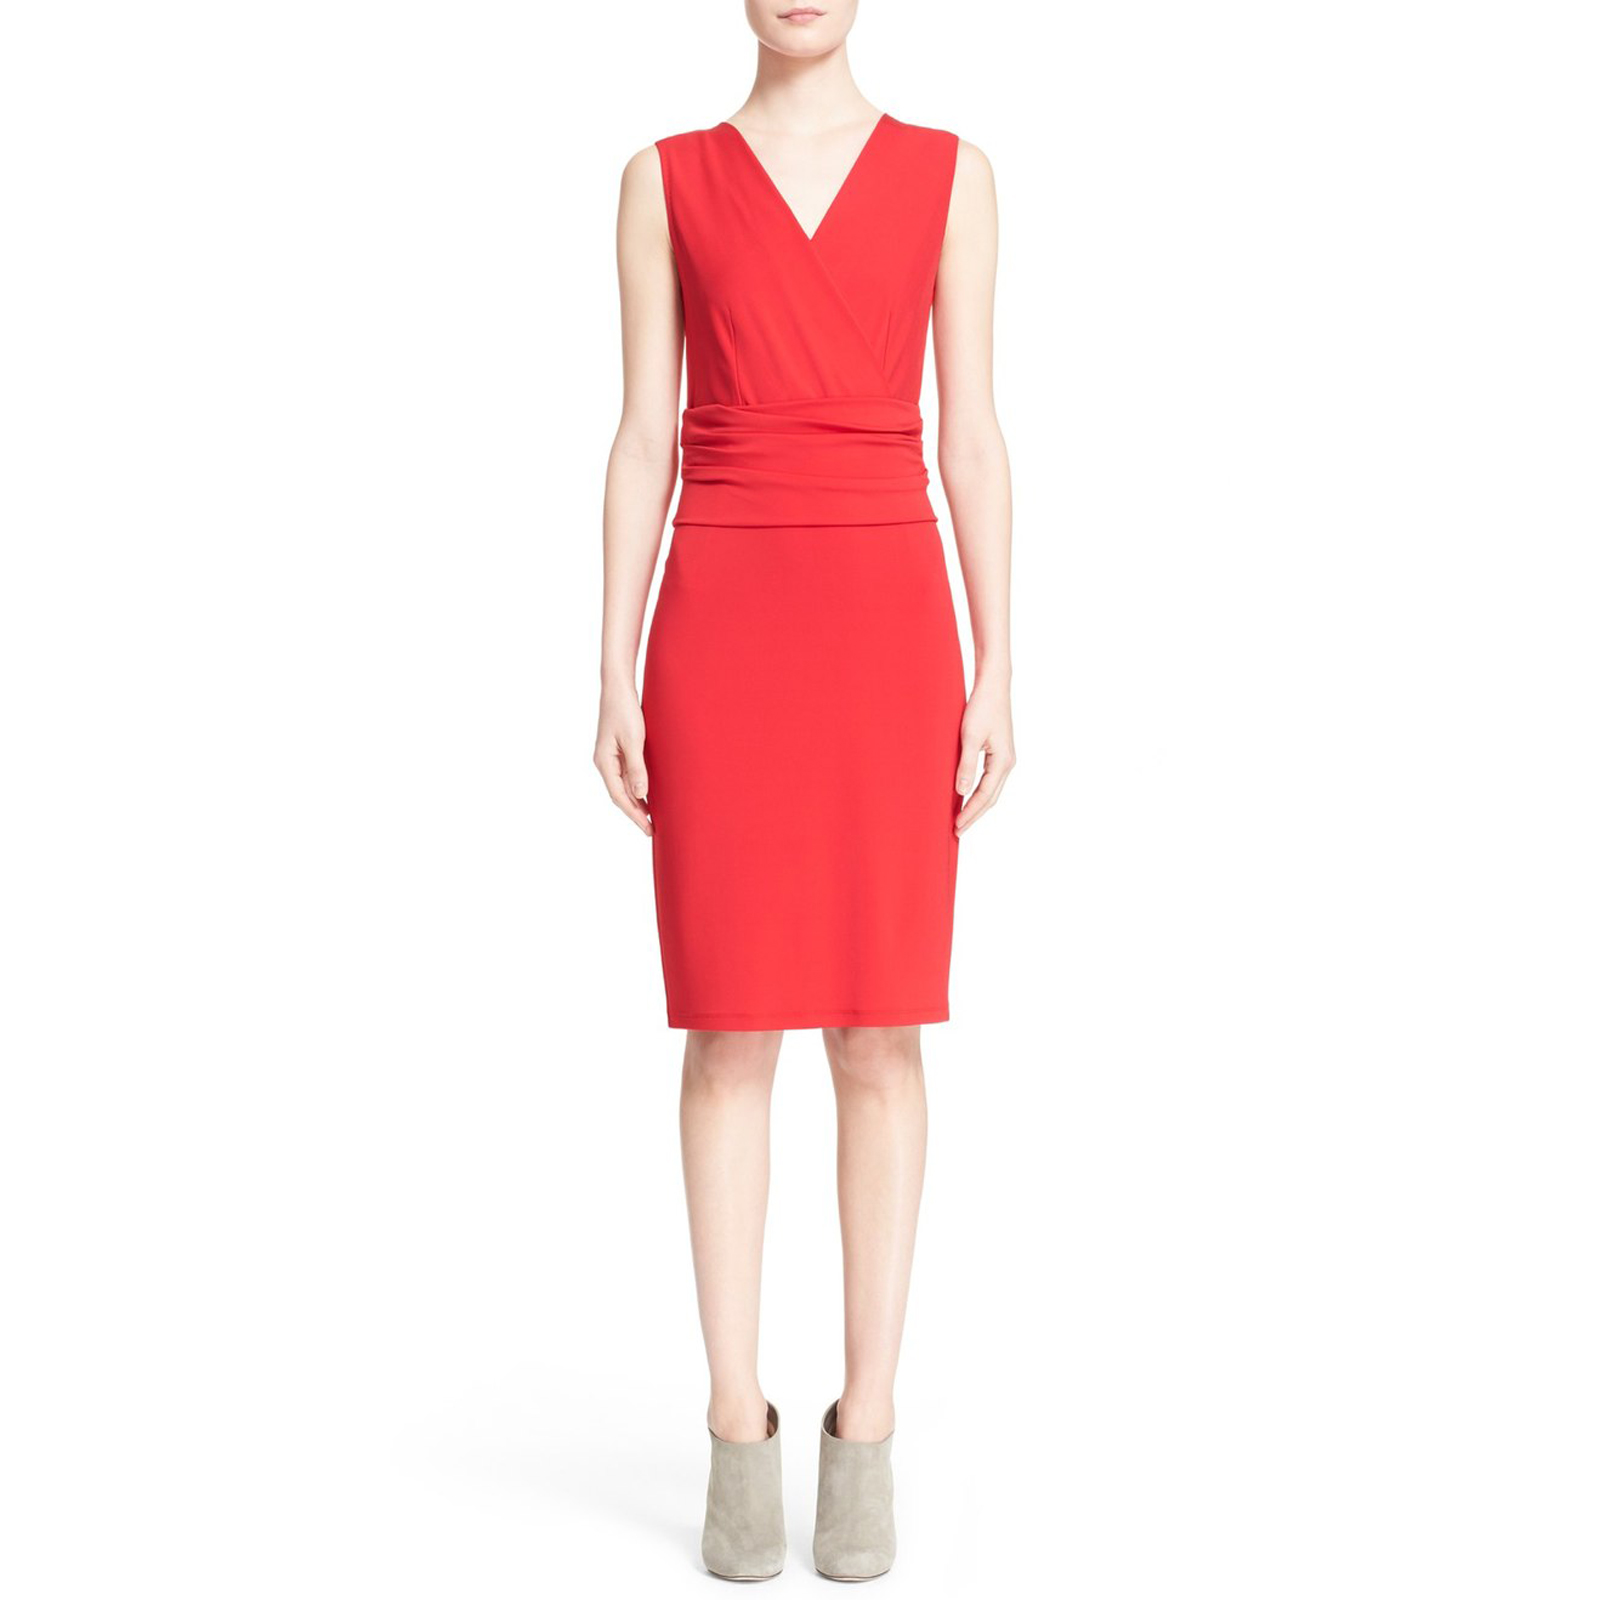 527a7535651d4 Lusso rosso Jersey guaina Dress Sz 6  795 NWT MAX MARA donna